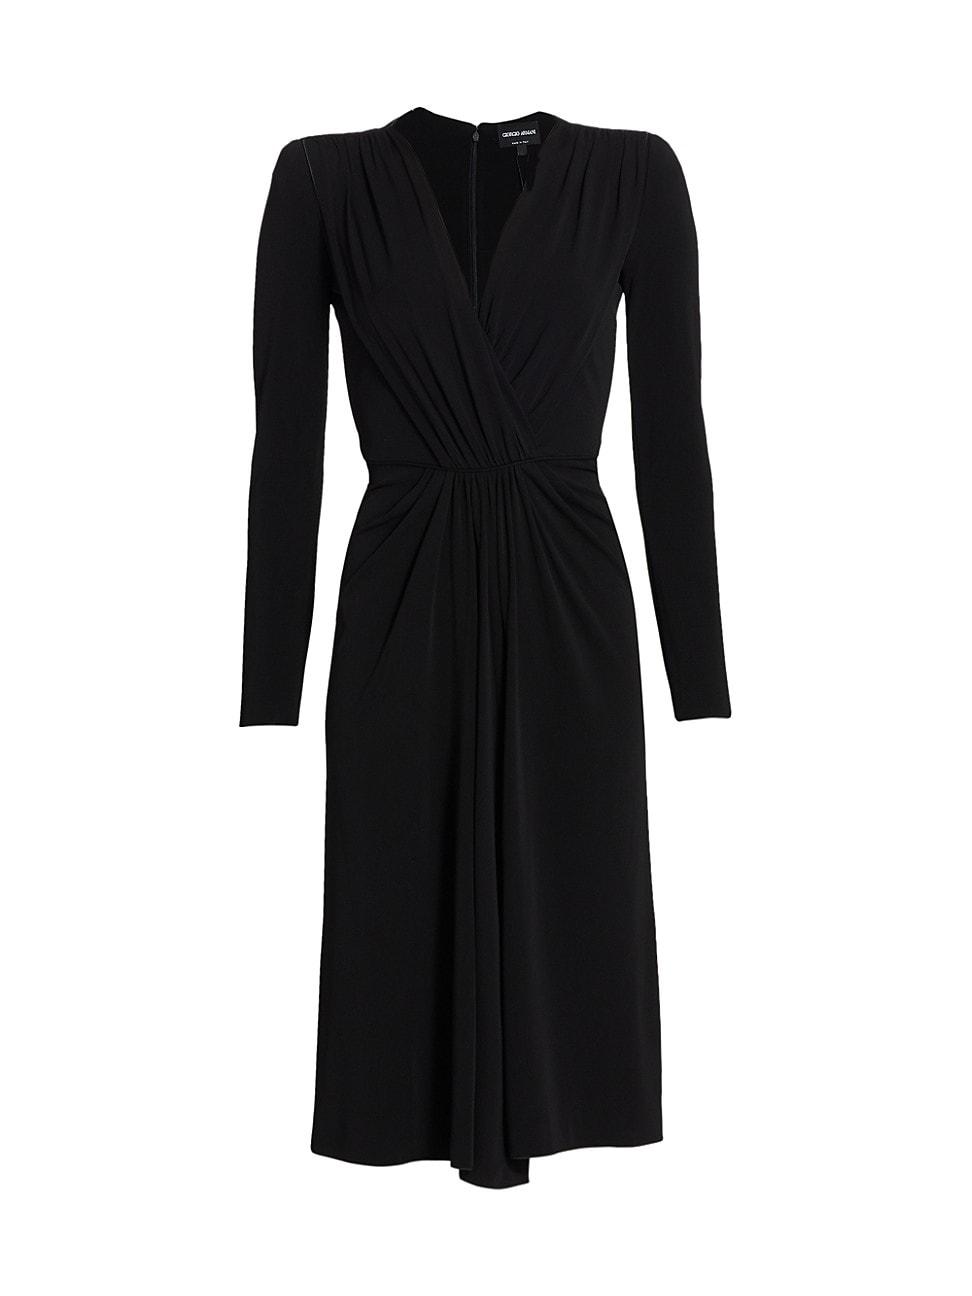 Giorgio Armani Dresses WOMEN'S JERSEY DRAPED COCKTAIL DRESS